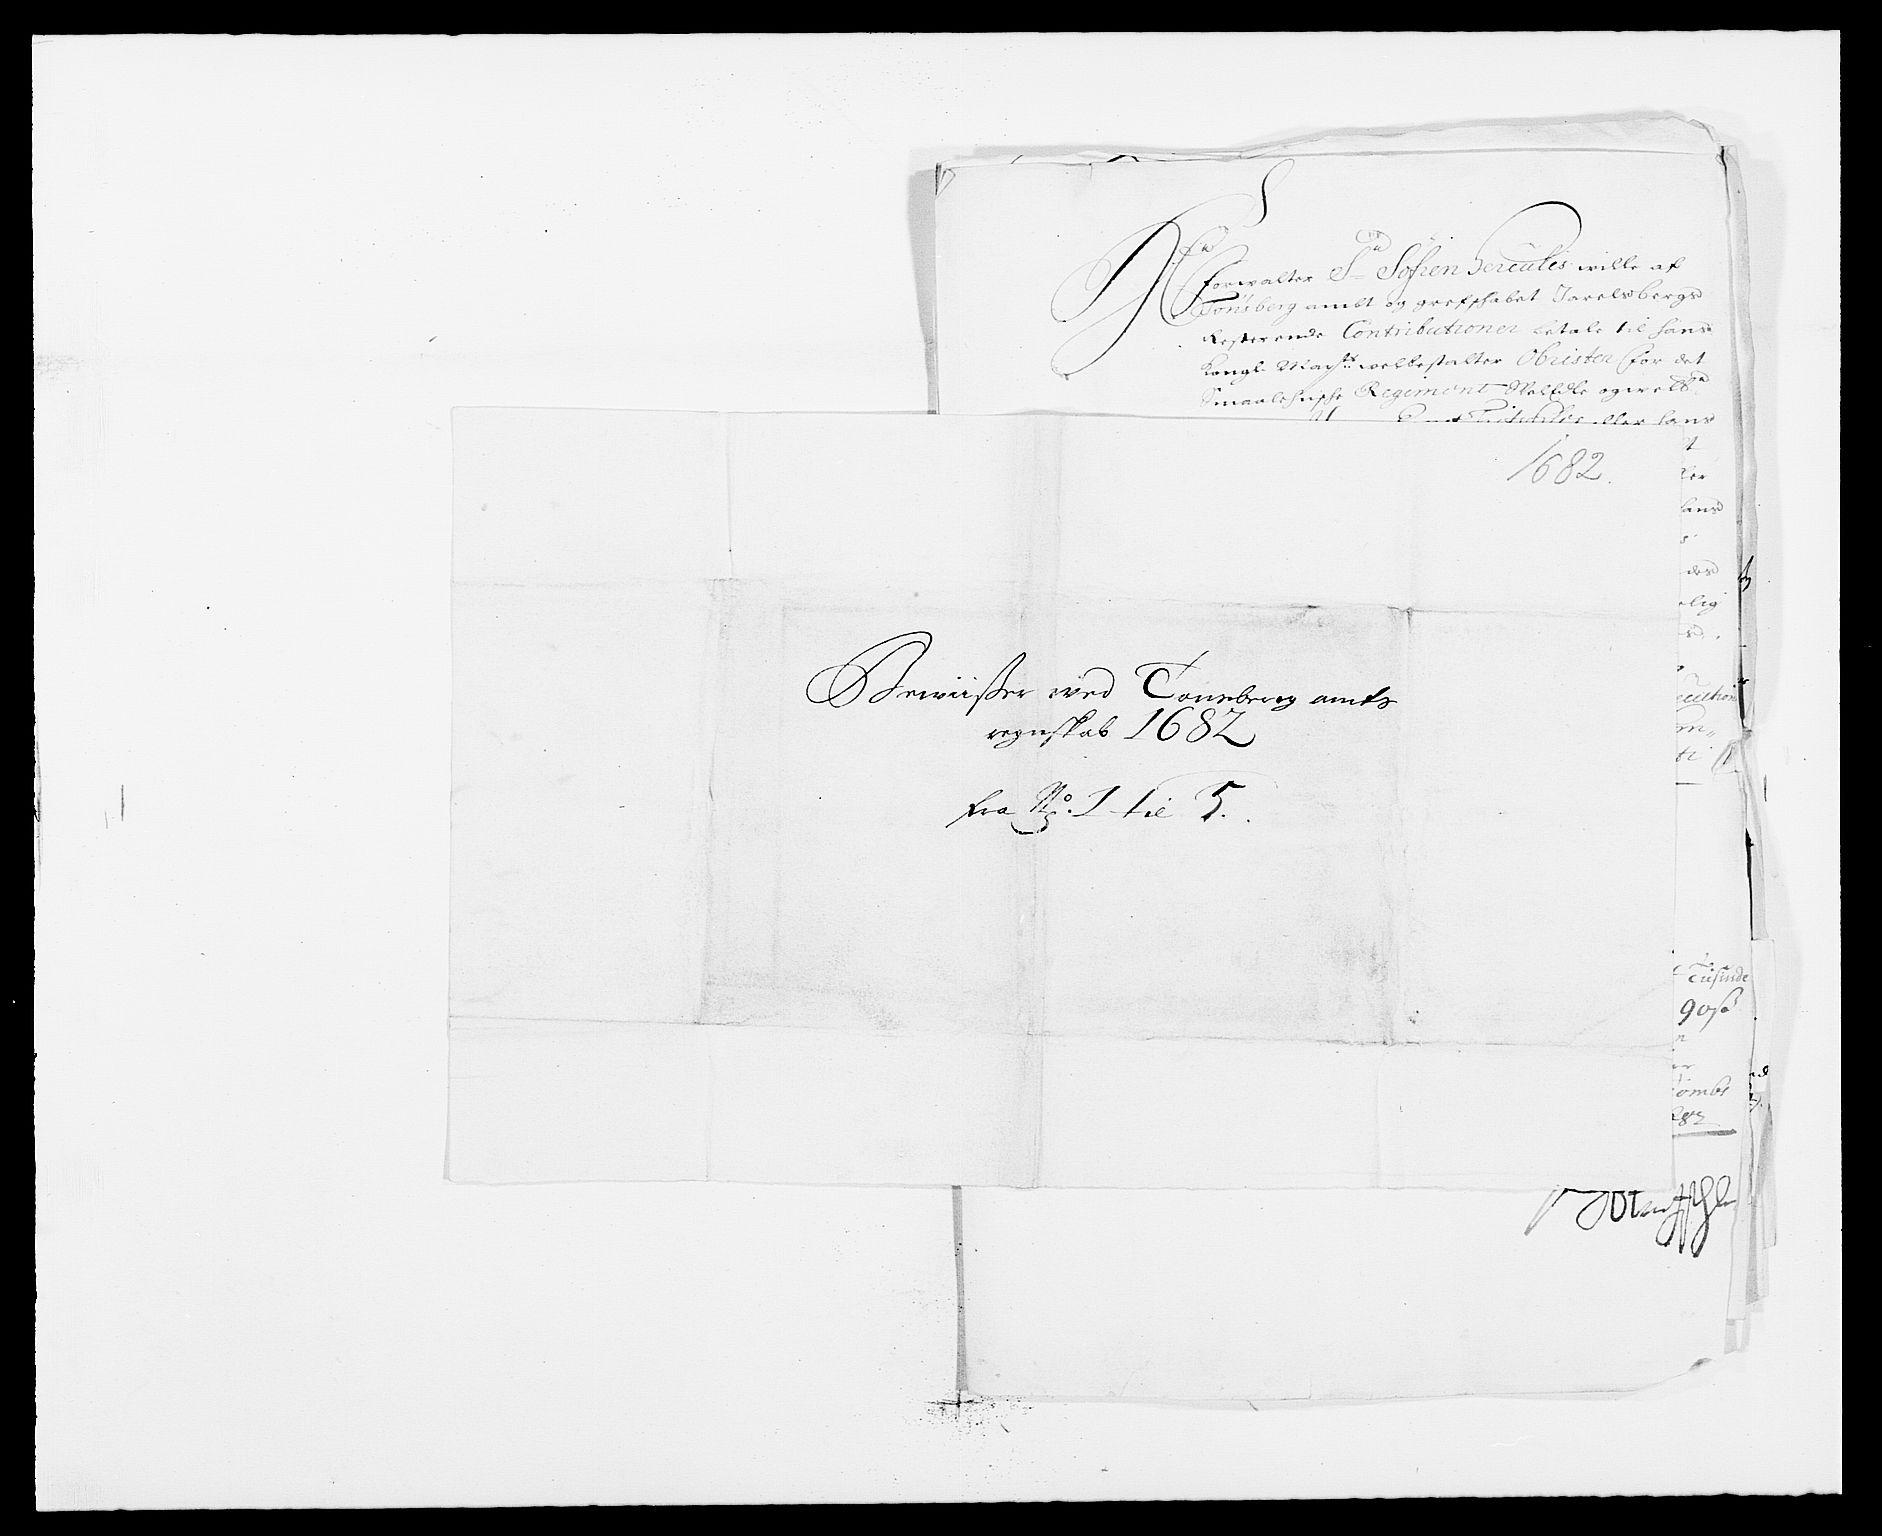 RA, Rentekammeret inntil 1814, Reviderte regnskaper, Fogderegnskap, R32/L1851: Fogderegnskap Jarlsberg grevskap, 1682, s. 321